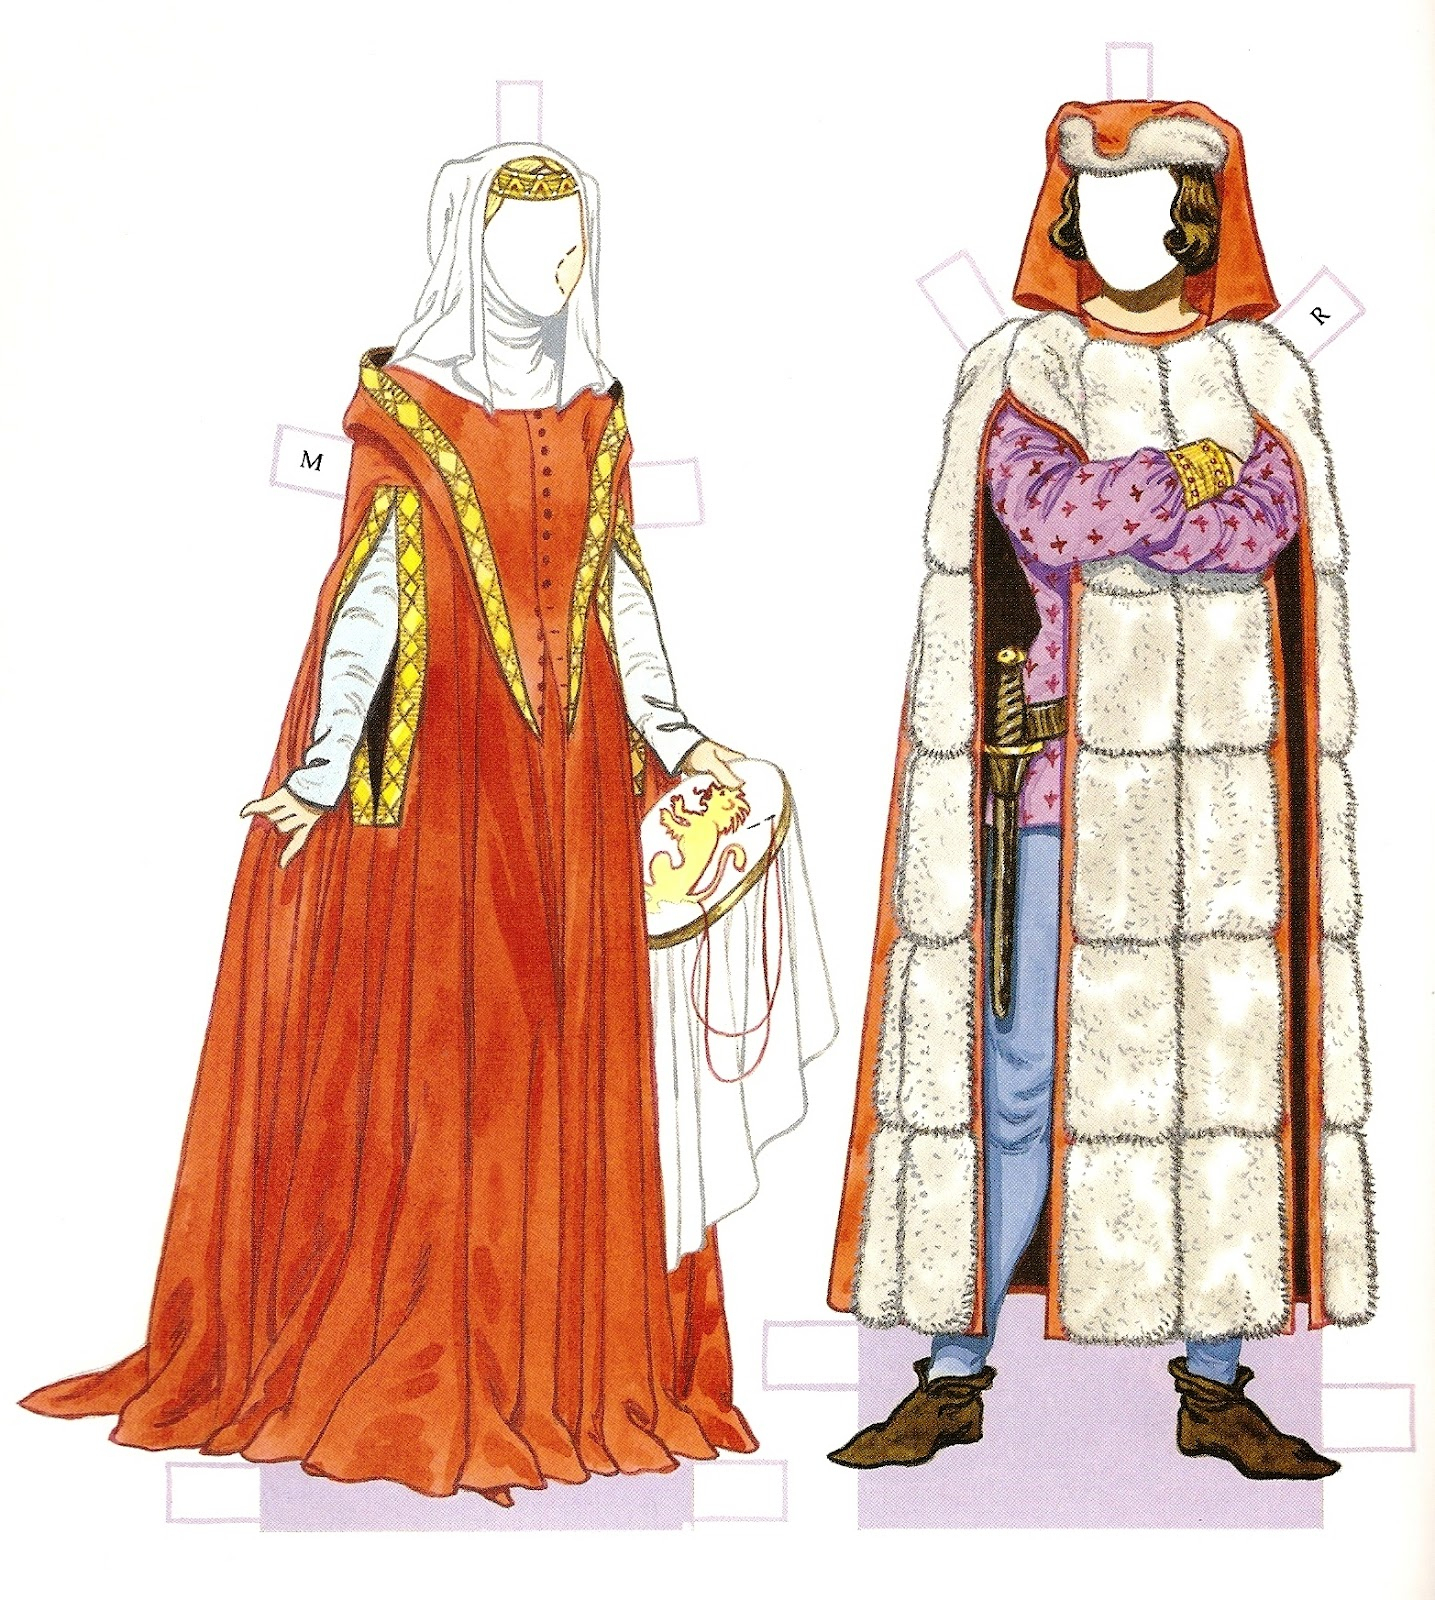 Medieval Paper Dolls Printable   Download Them Or Print - Medieval Paper Dolls Free Printable